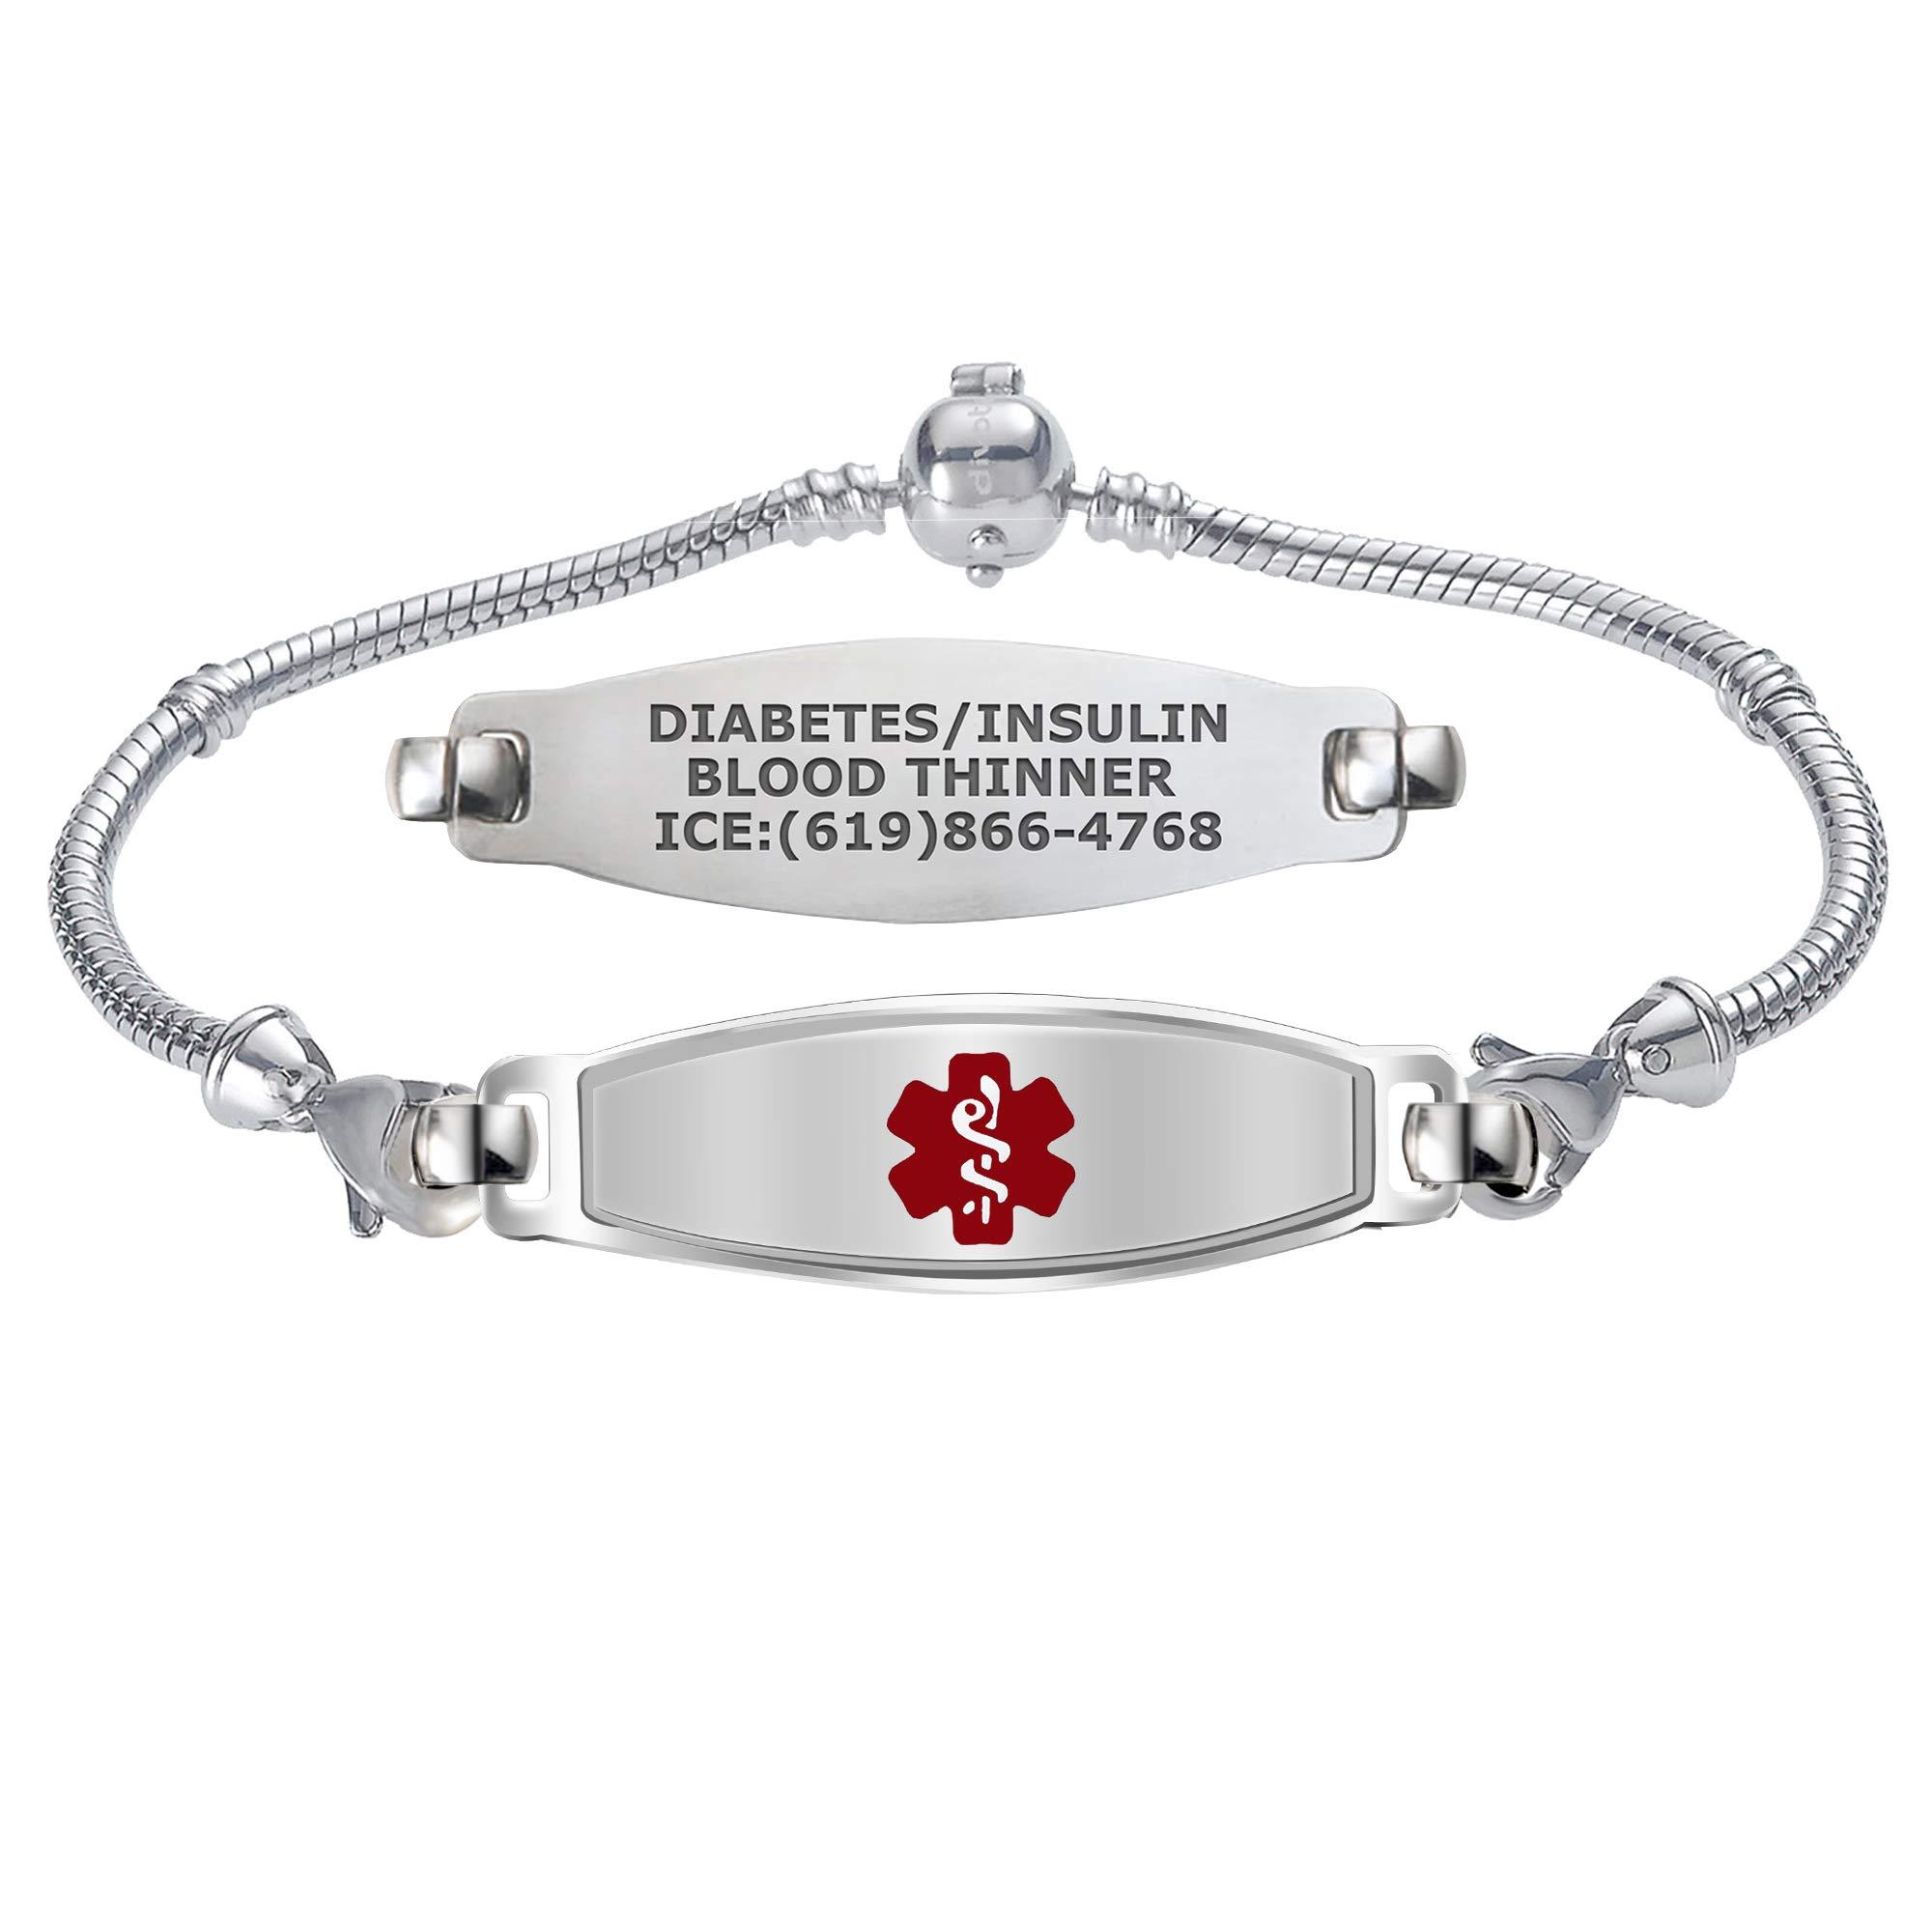 Divoti Custom Engraved Medical Alert Bracelets for Women, Stainless Steel Medical Bracelet, Medical ID Bracelet w/Free Engraving - Elegant Contempo Tag w/DYO European Bead Charm-Red-8.0'' by Divoti